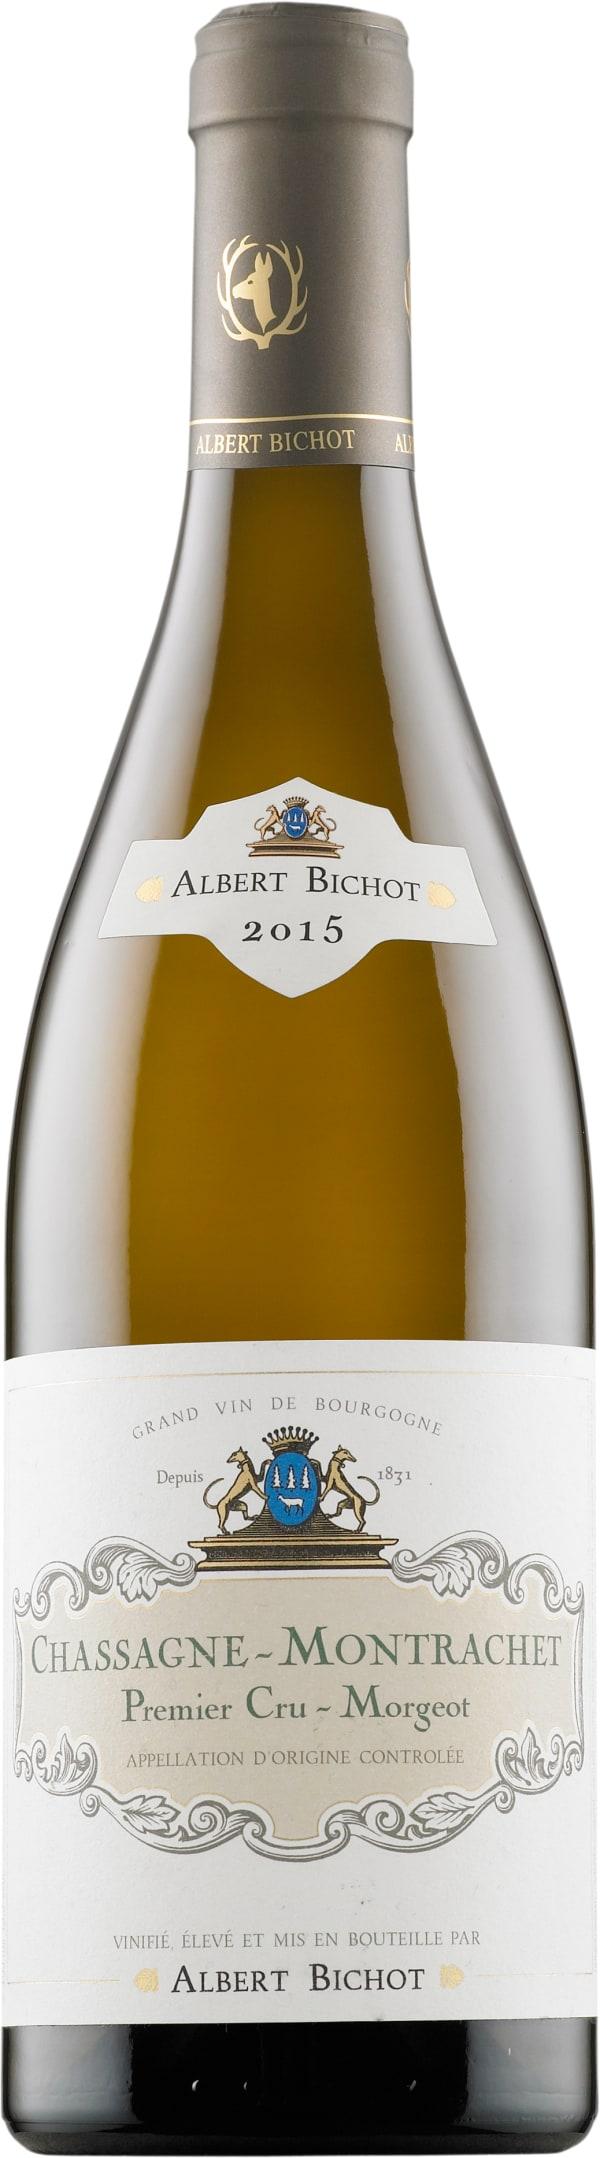 Albert Bichot Chassagne-Montrachet 1er Cru Morgeot 2015